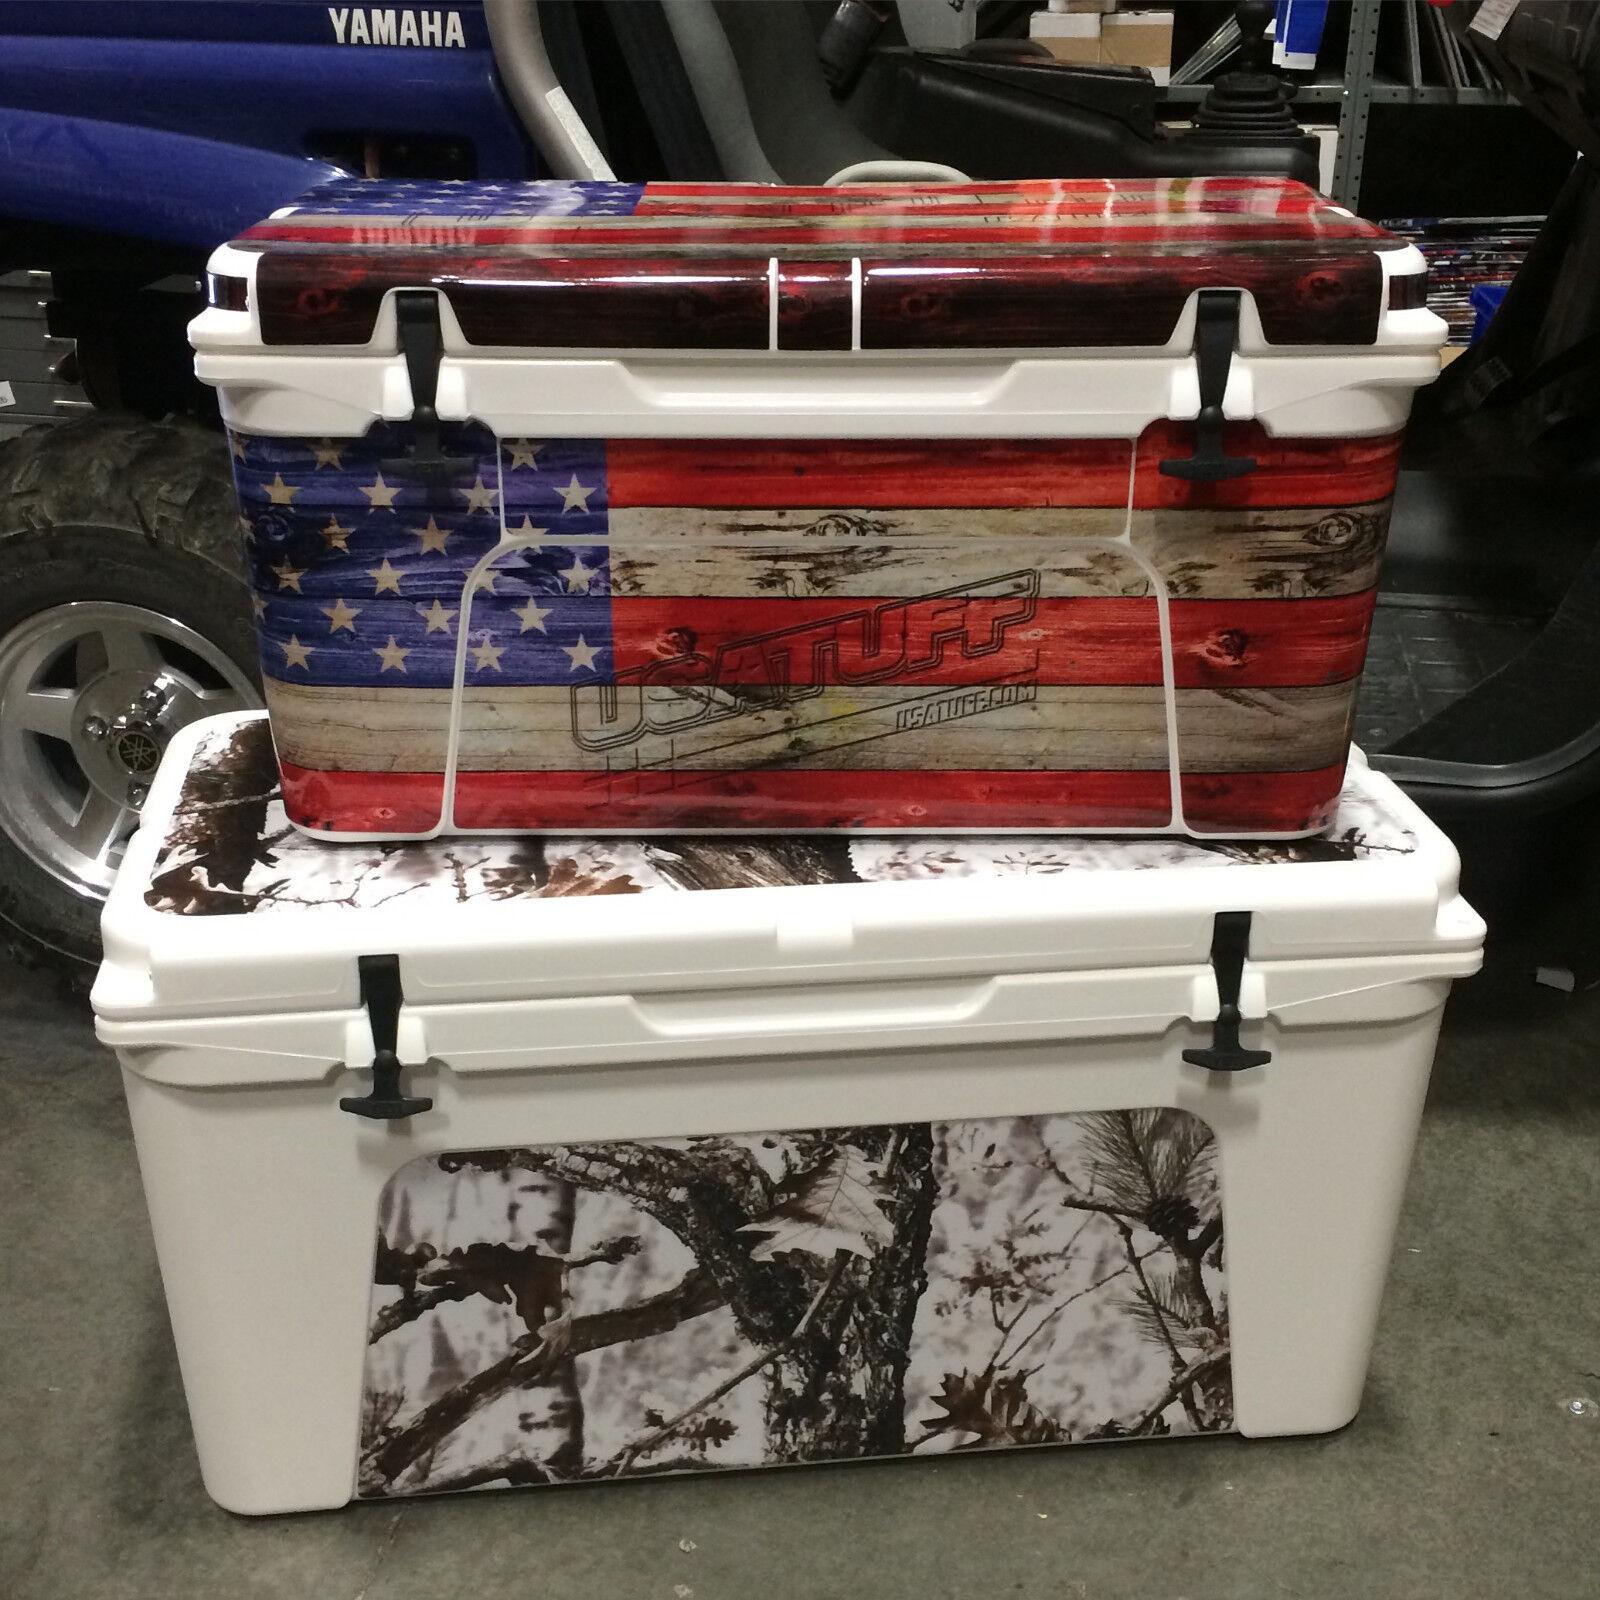 USATuff Cooler Decal Wrap fits YETI Tundra 110qt L+I USA USA L+I Blau Line Flag e47fca